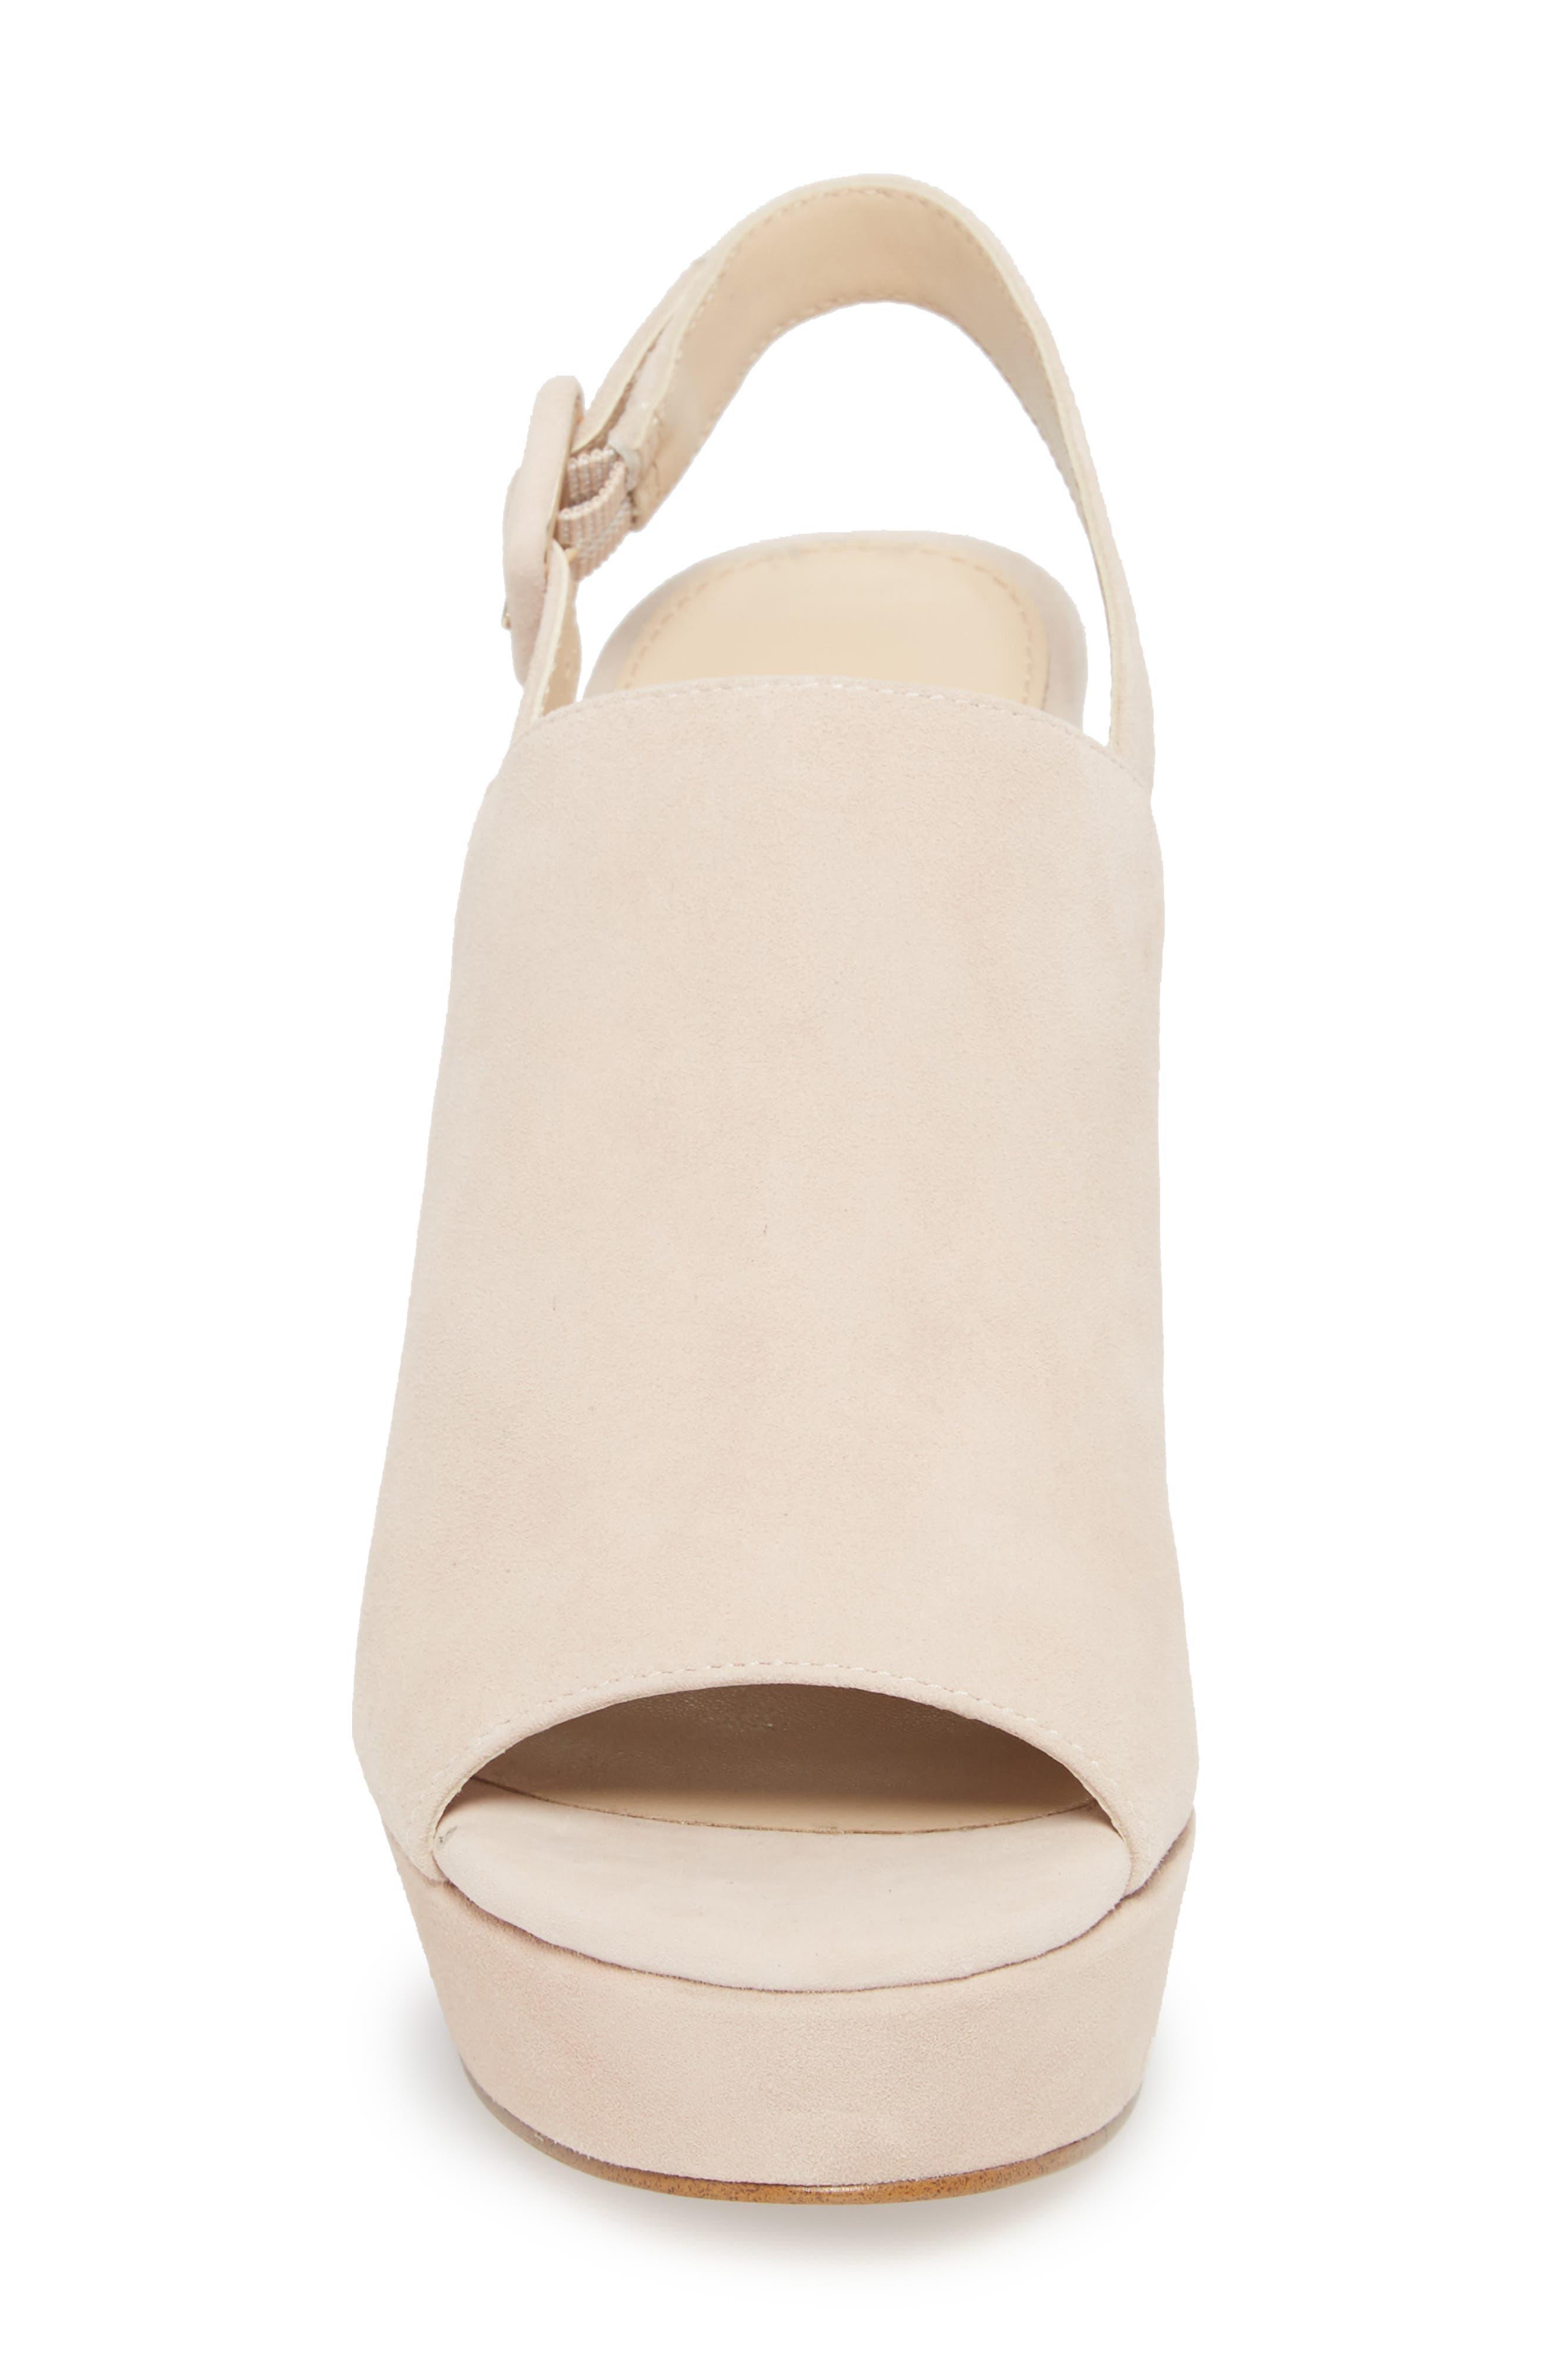 Jolene Platform Sandal,                             Alternate thumbnail 4, color,                             Blush Suede